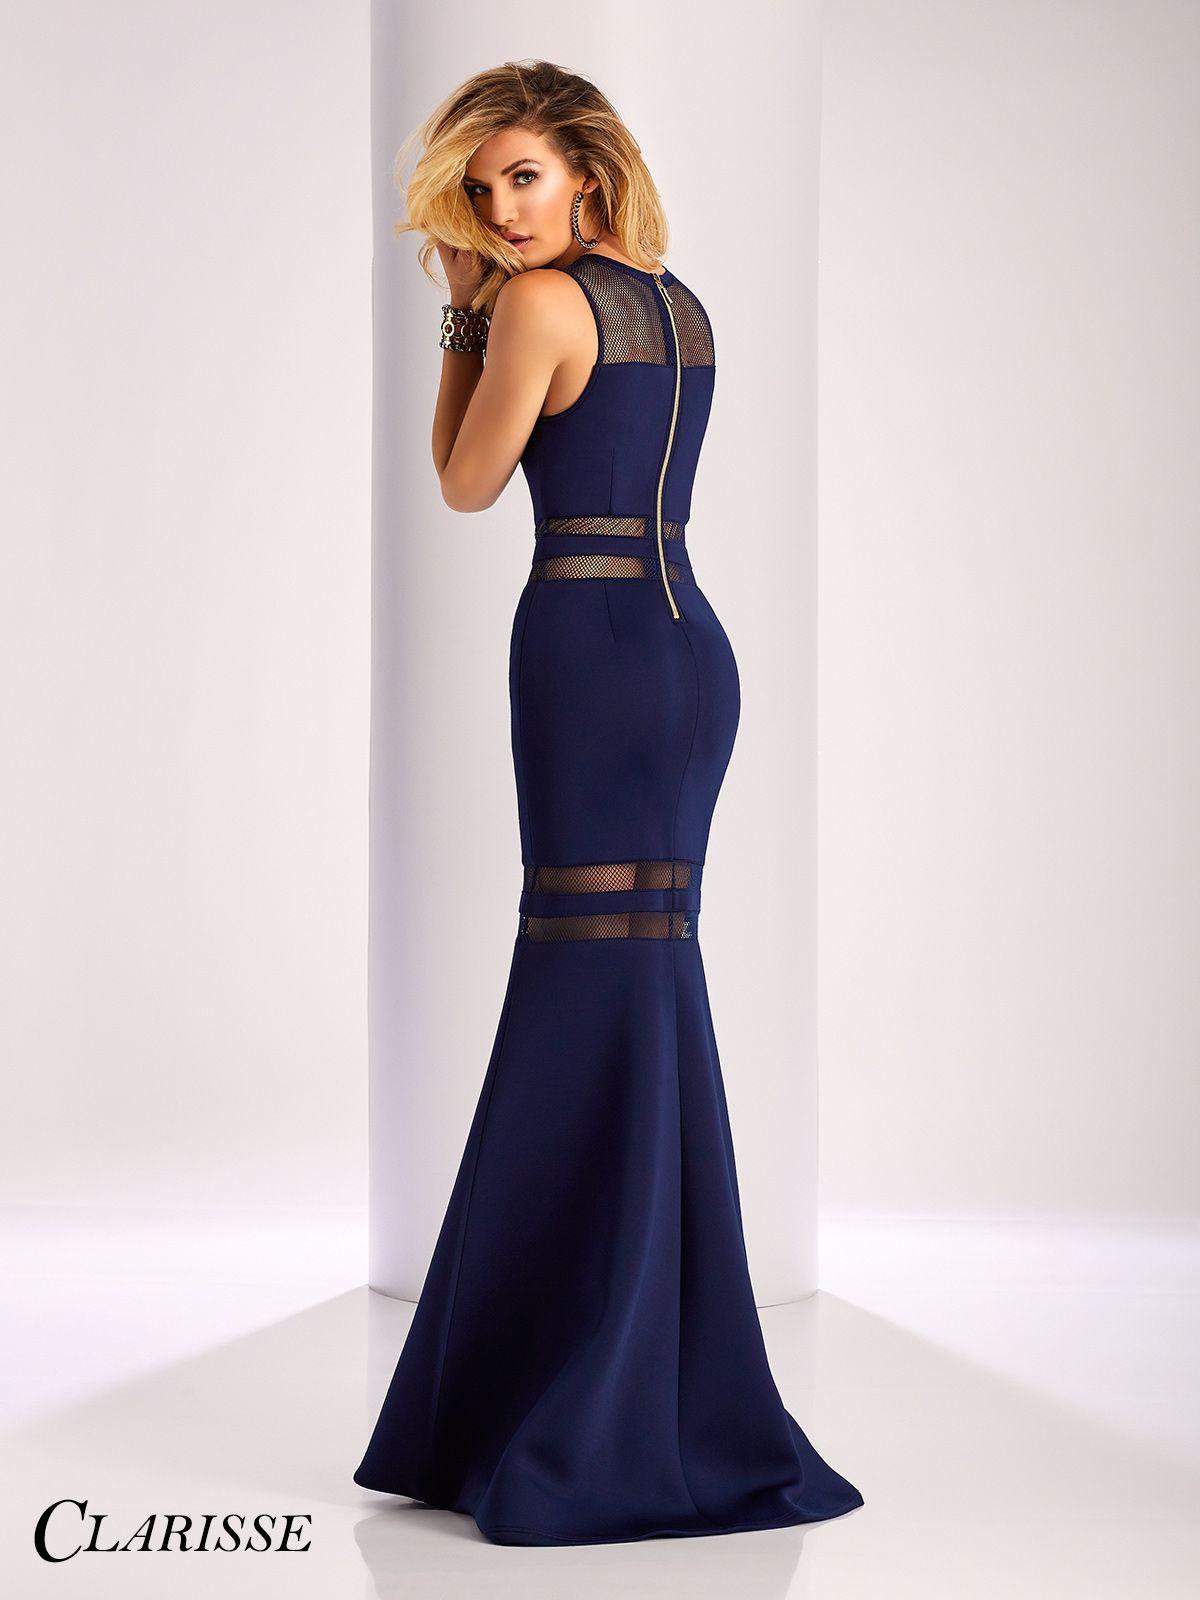 22f39a63643 Clarisse Mesh Detail Neoprene Prom Dress 3086